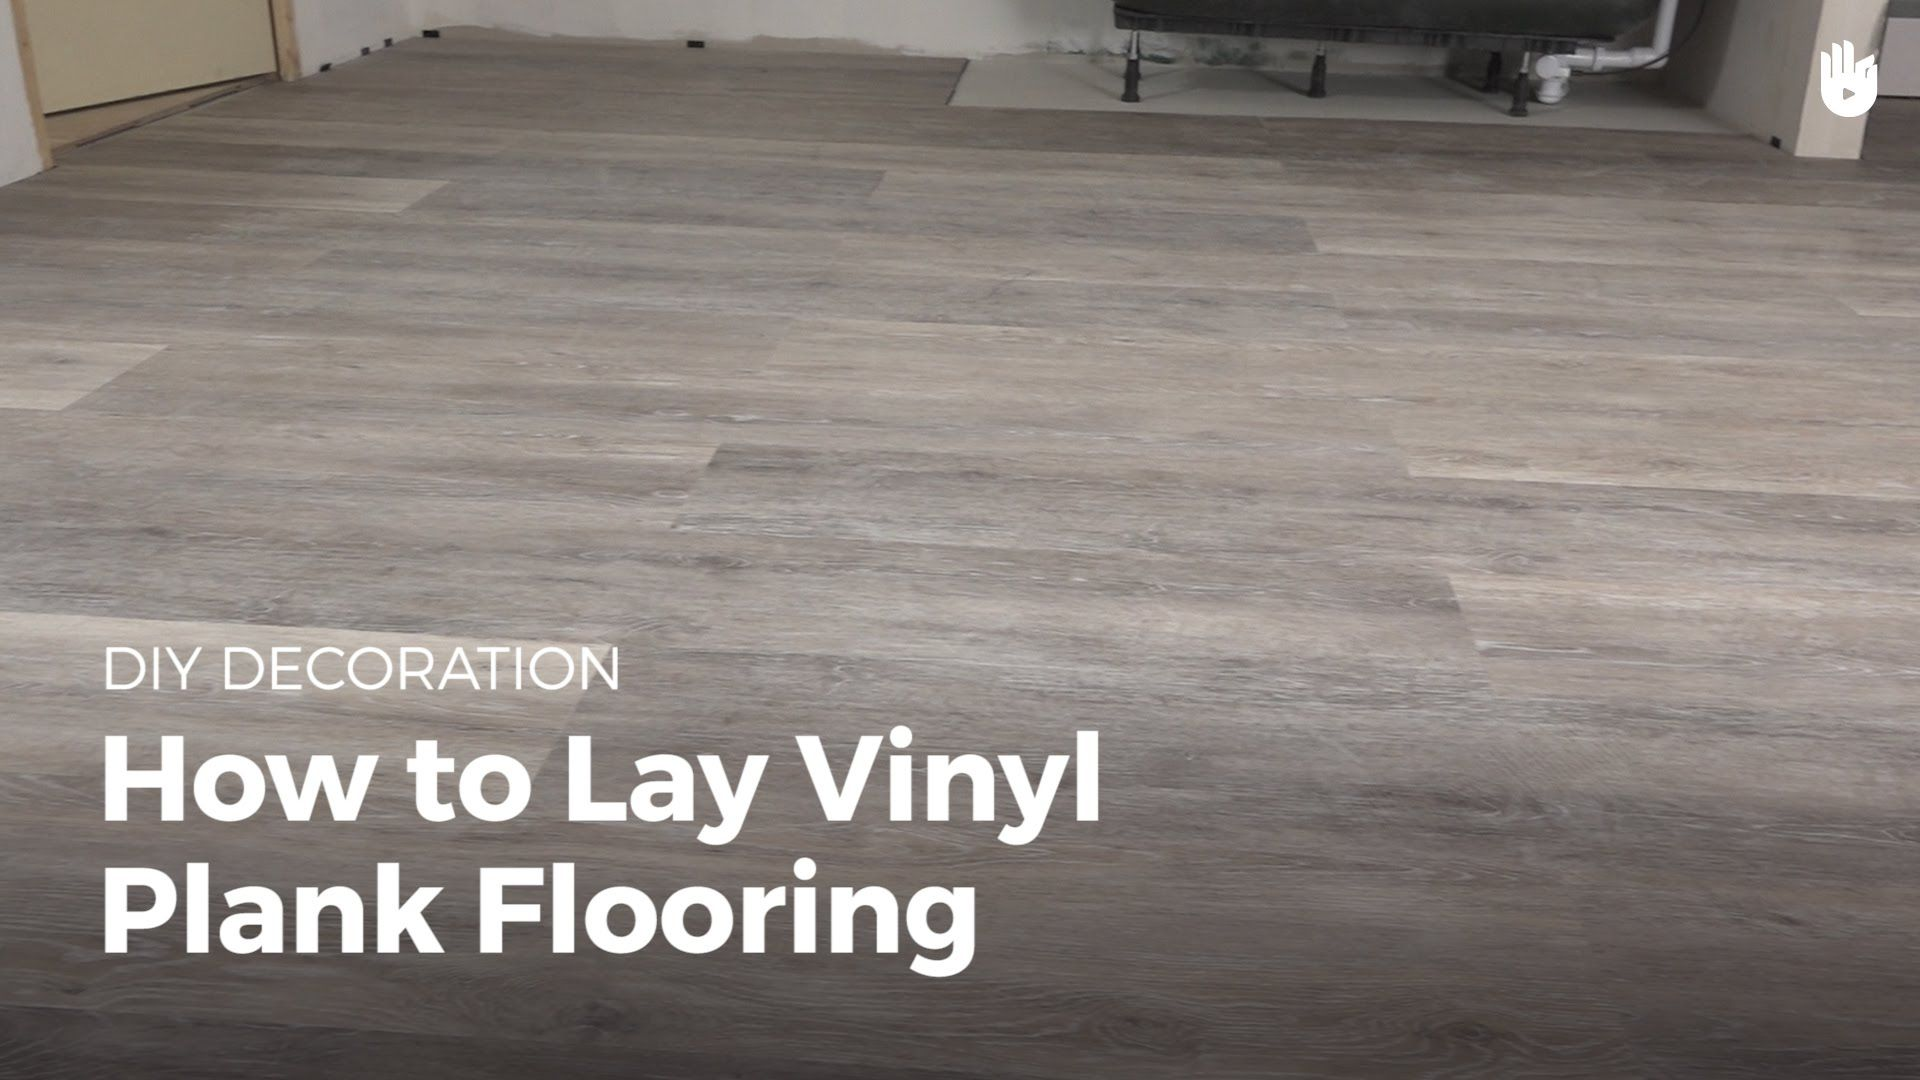 How To Lay Vinyl Flooring Diy Projects Vinyl Plank Flooring